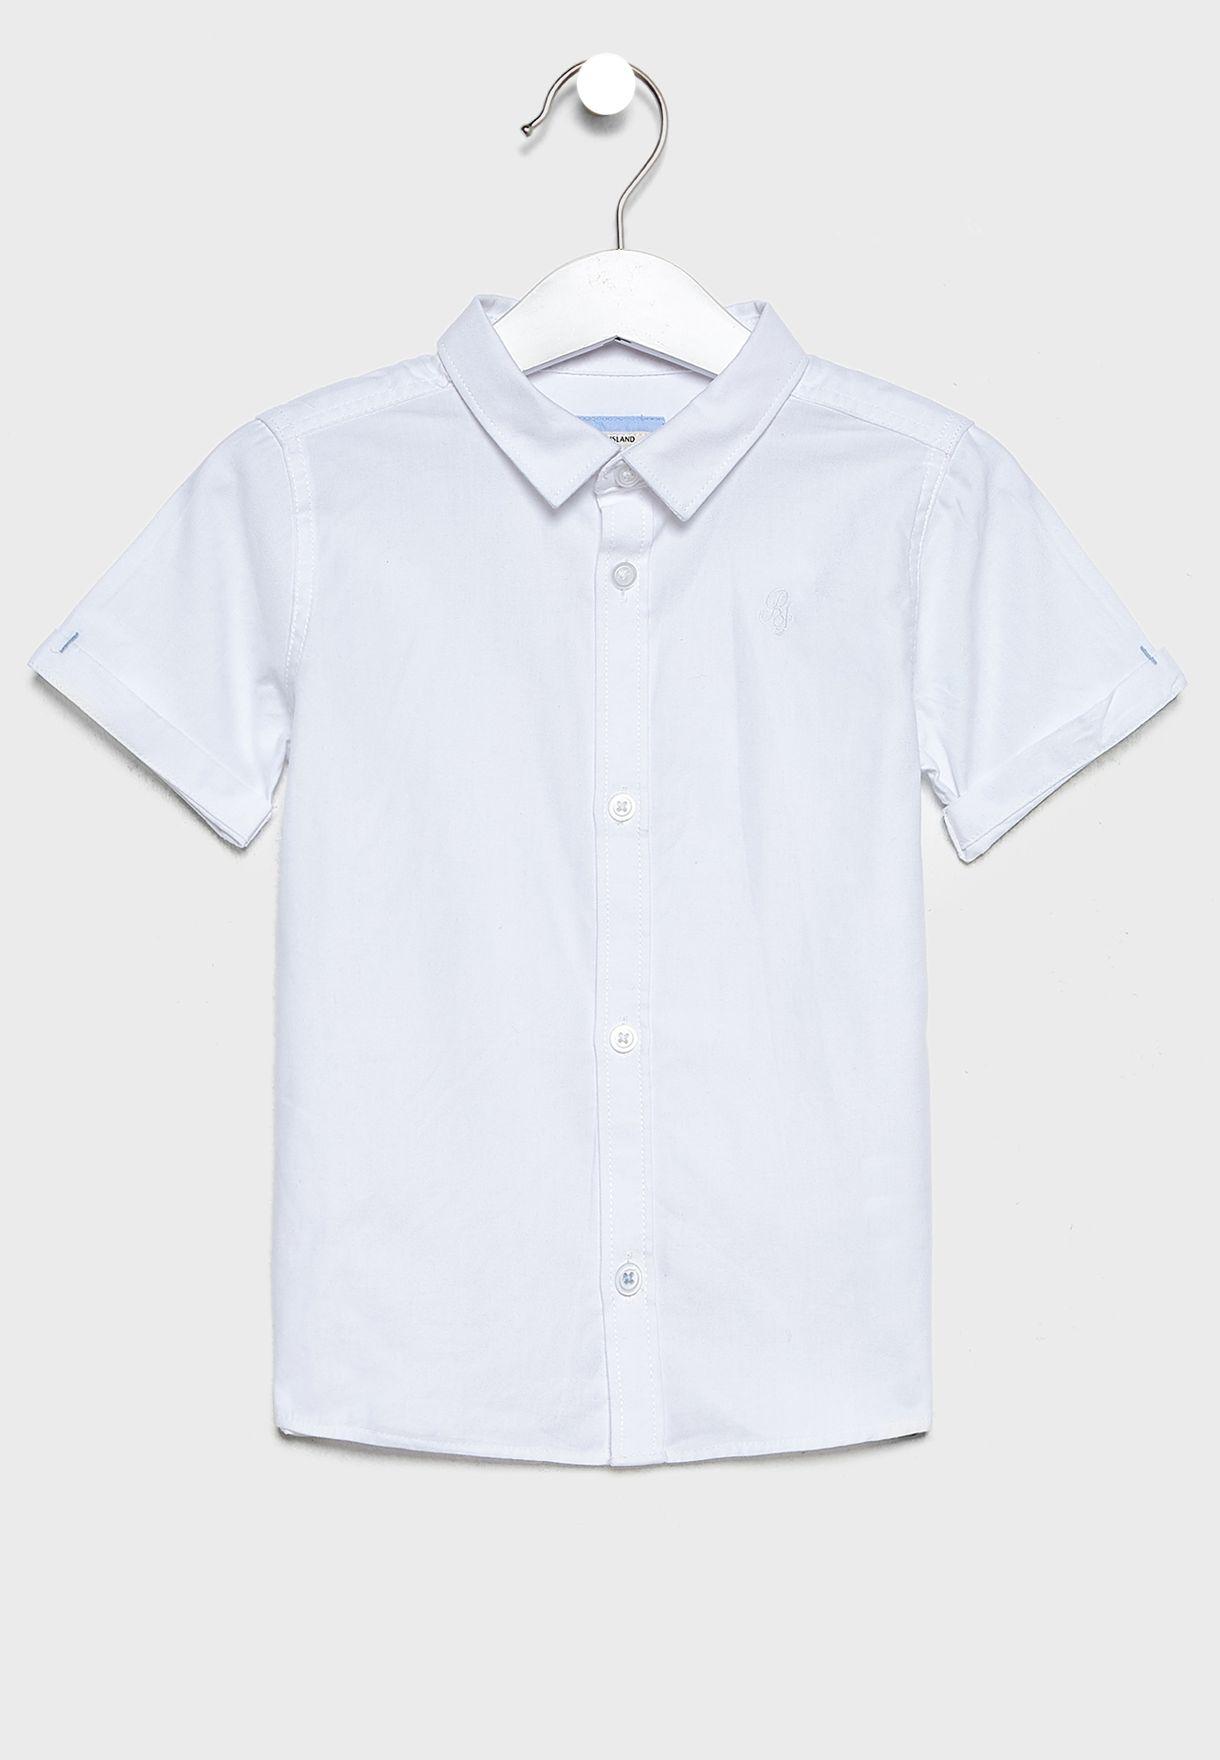 قميص بازرار للبيبي